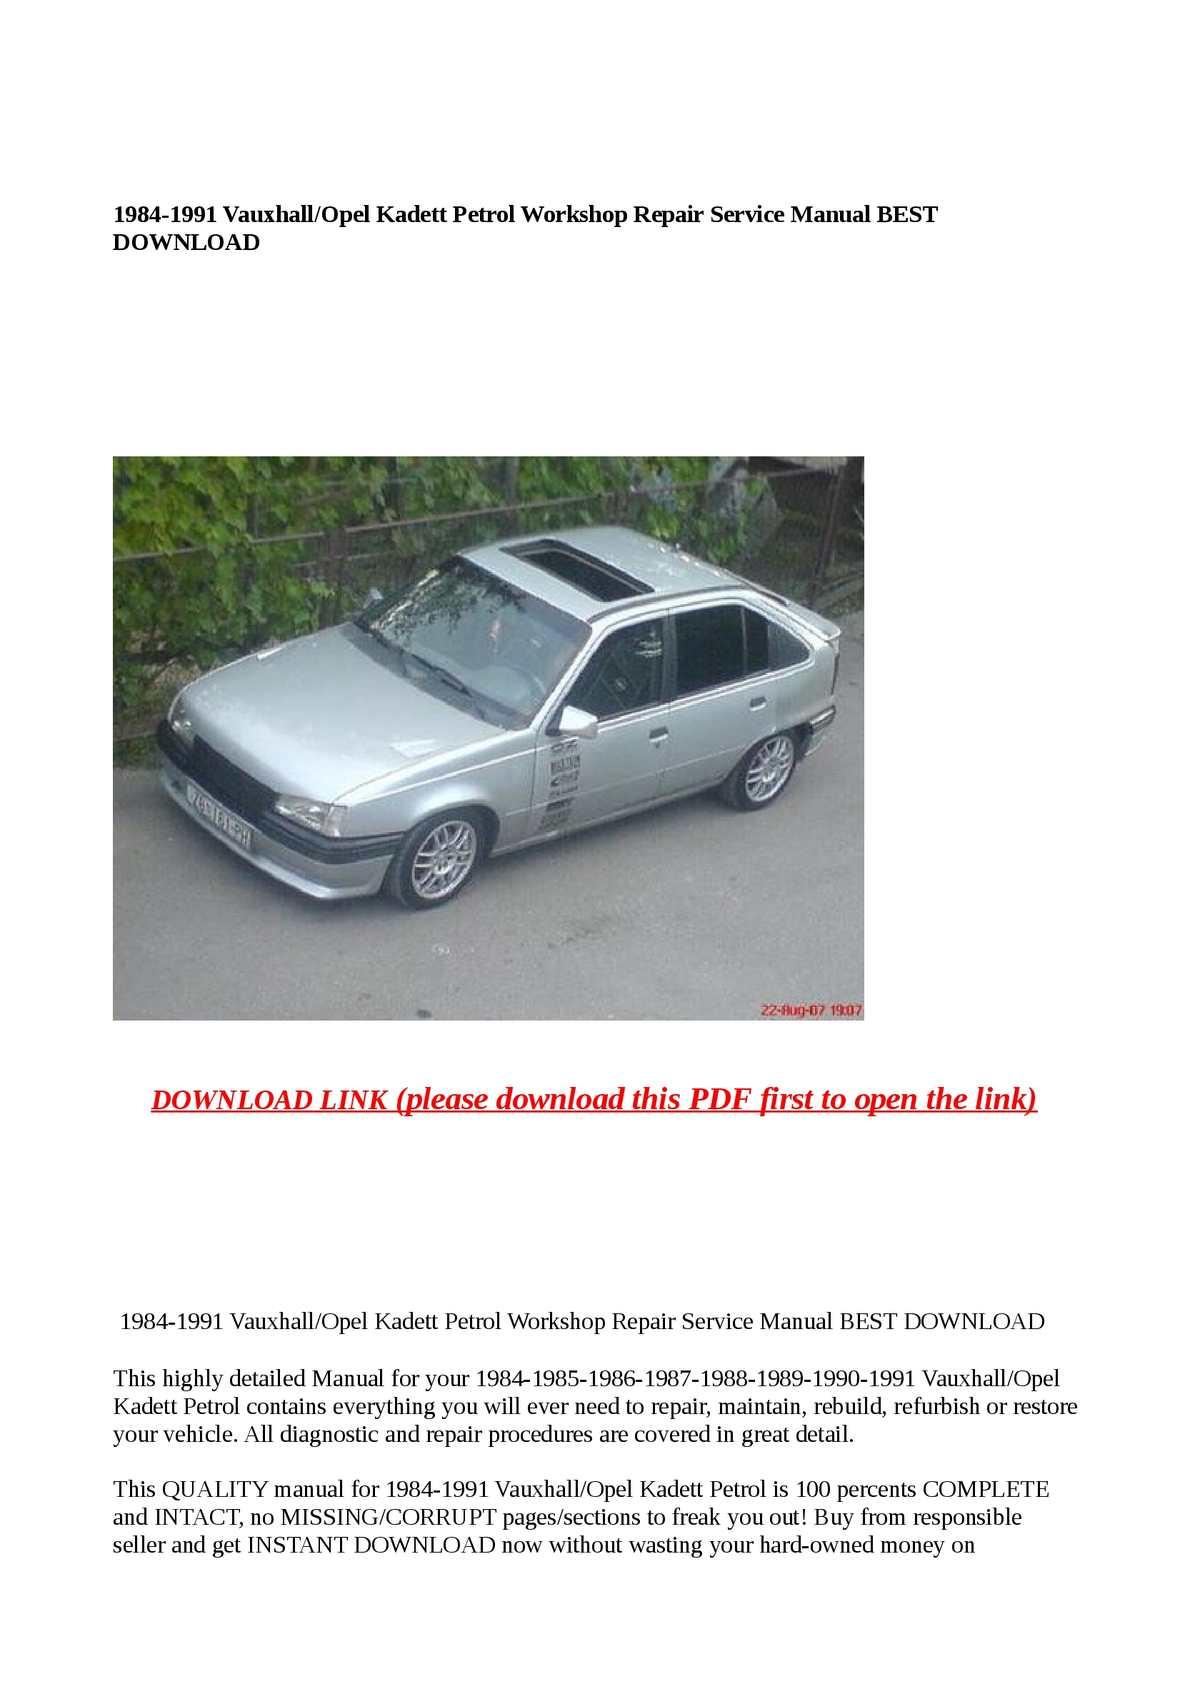 Calamo 1984 1991 Vauxhall Opel Kadett Petrol Workshop Repair Stereo Wiring Harness Free Download Diagrams Service Manual